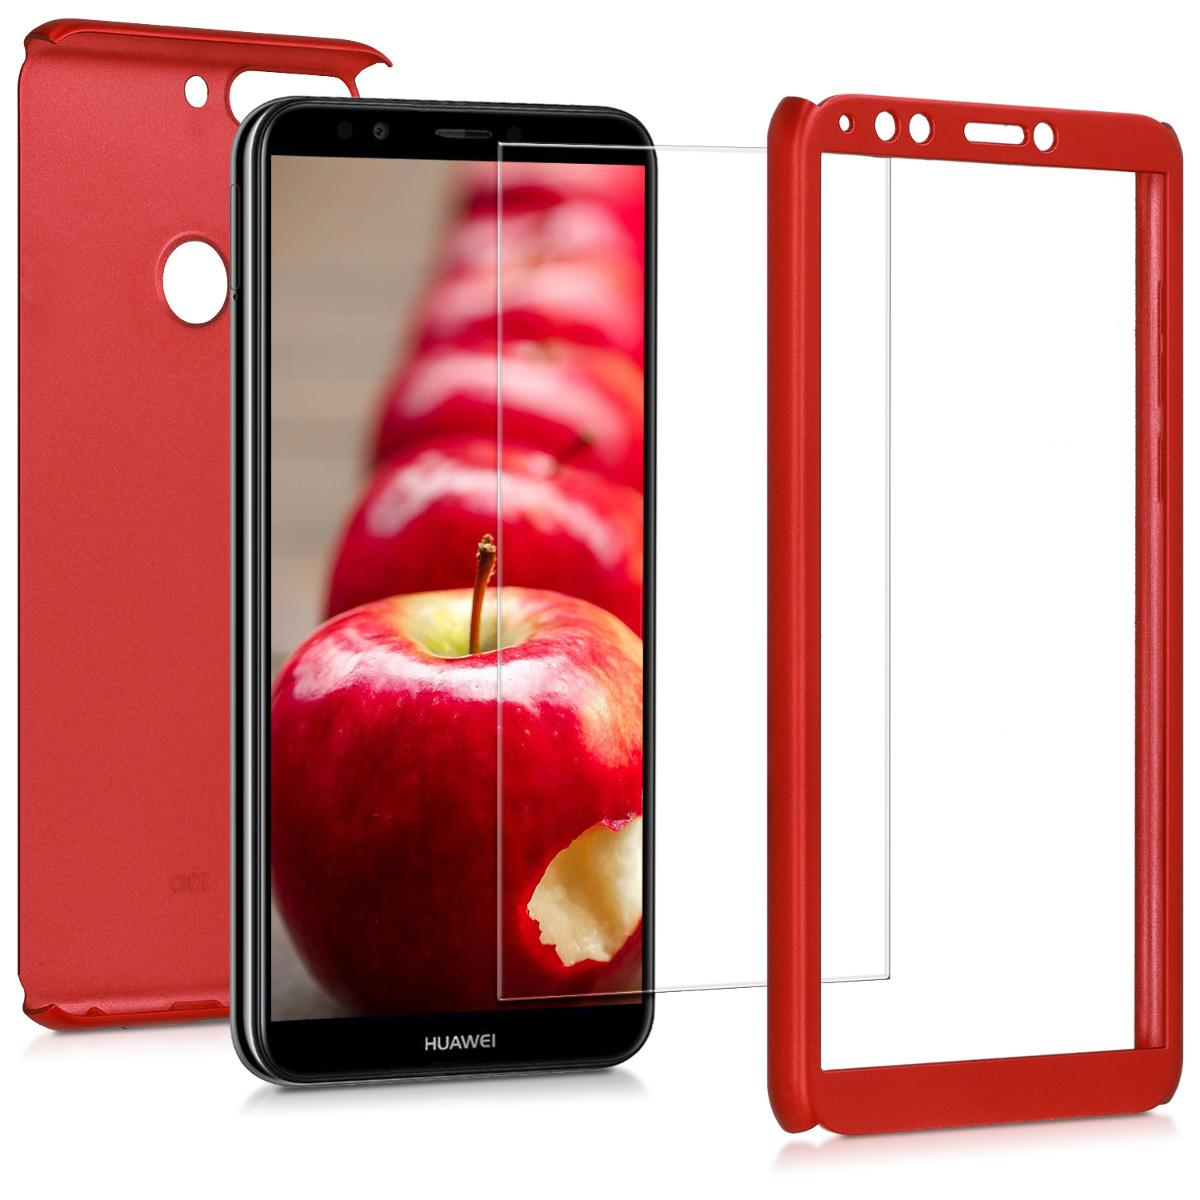 KW Θήκη Full Body with Screen Protector - Huawei Y7 (2018) /Y7 Prime (2018) - Metallic Dark Red (45640.36)